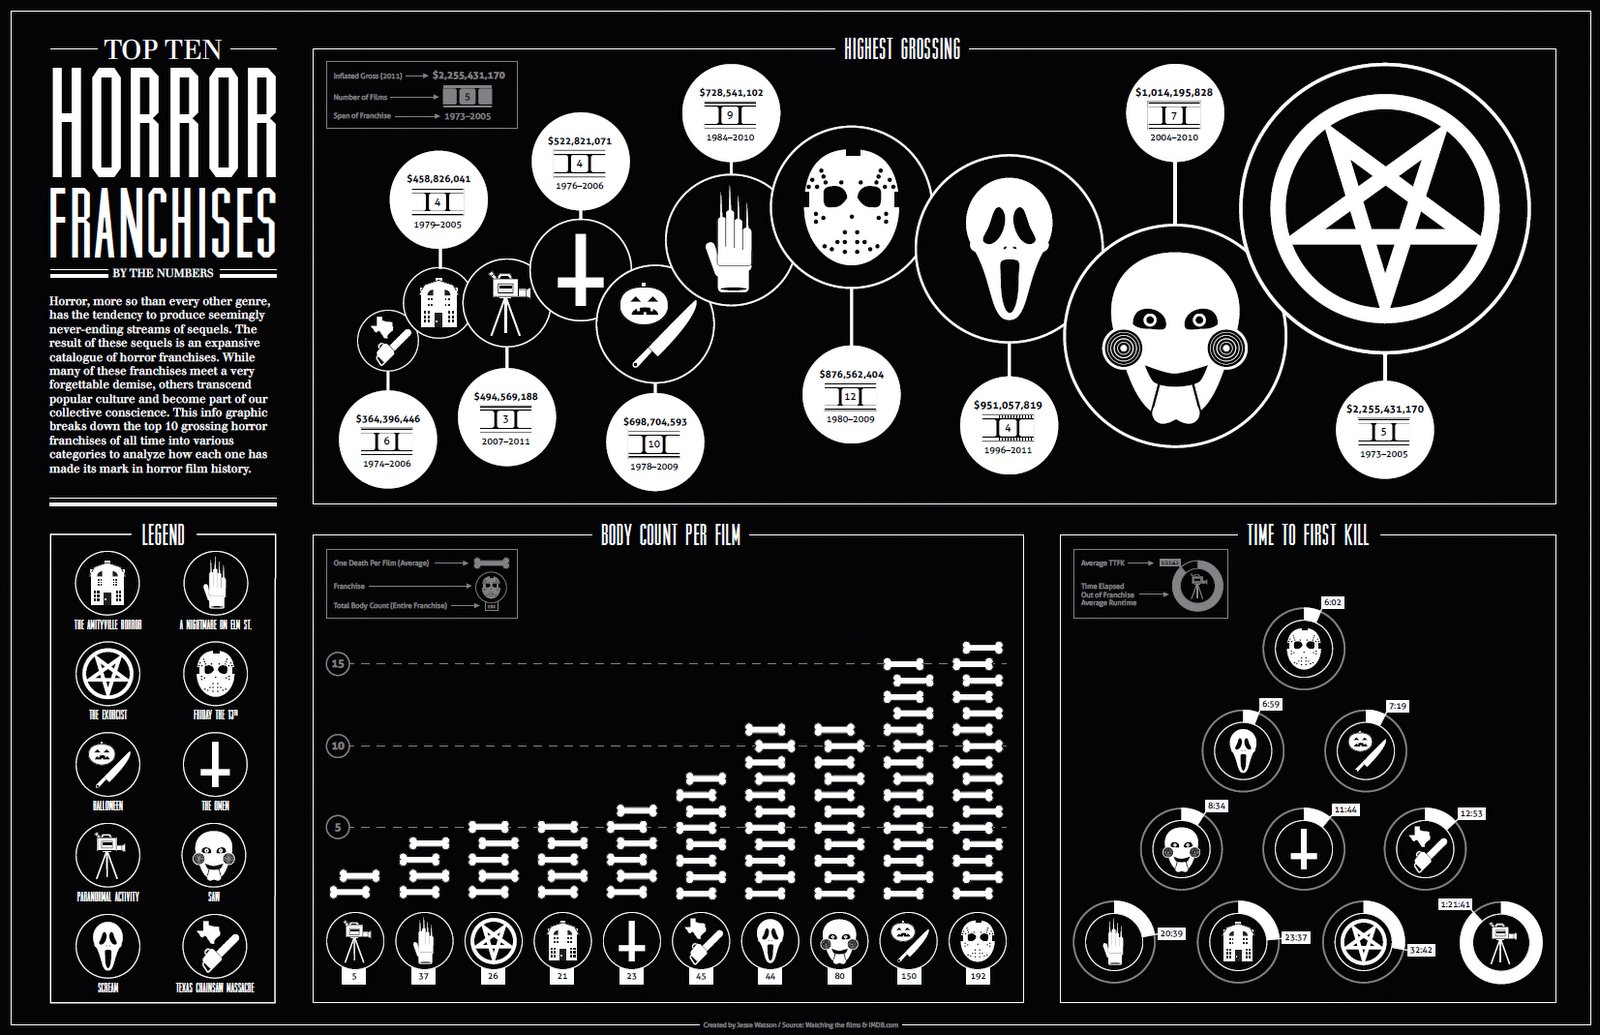 http://2.bp.blogspot.com/-vK5tSTeMgYI/T1kMHASz1yI/AAAAAAAADfE/eA7naKfQMtM/s1600/horror-box-office-infographic.png